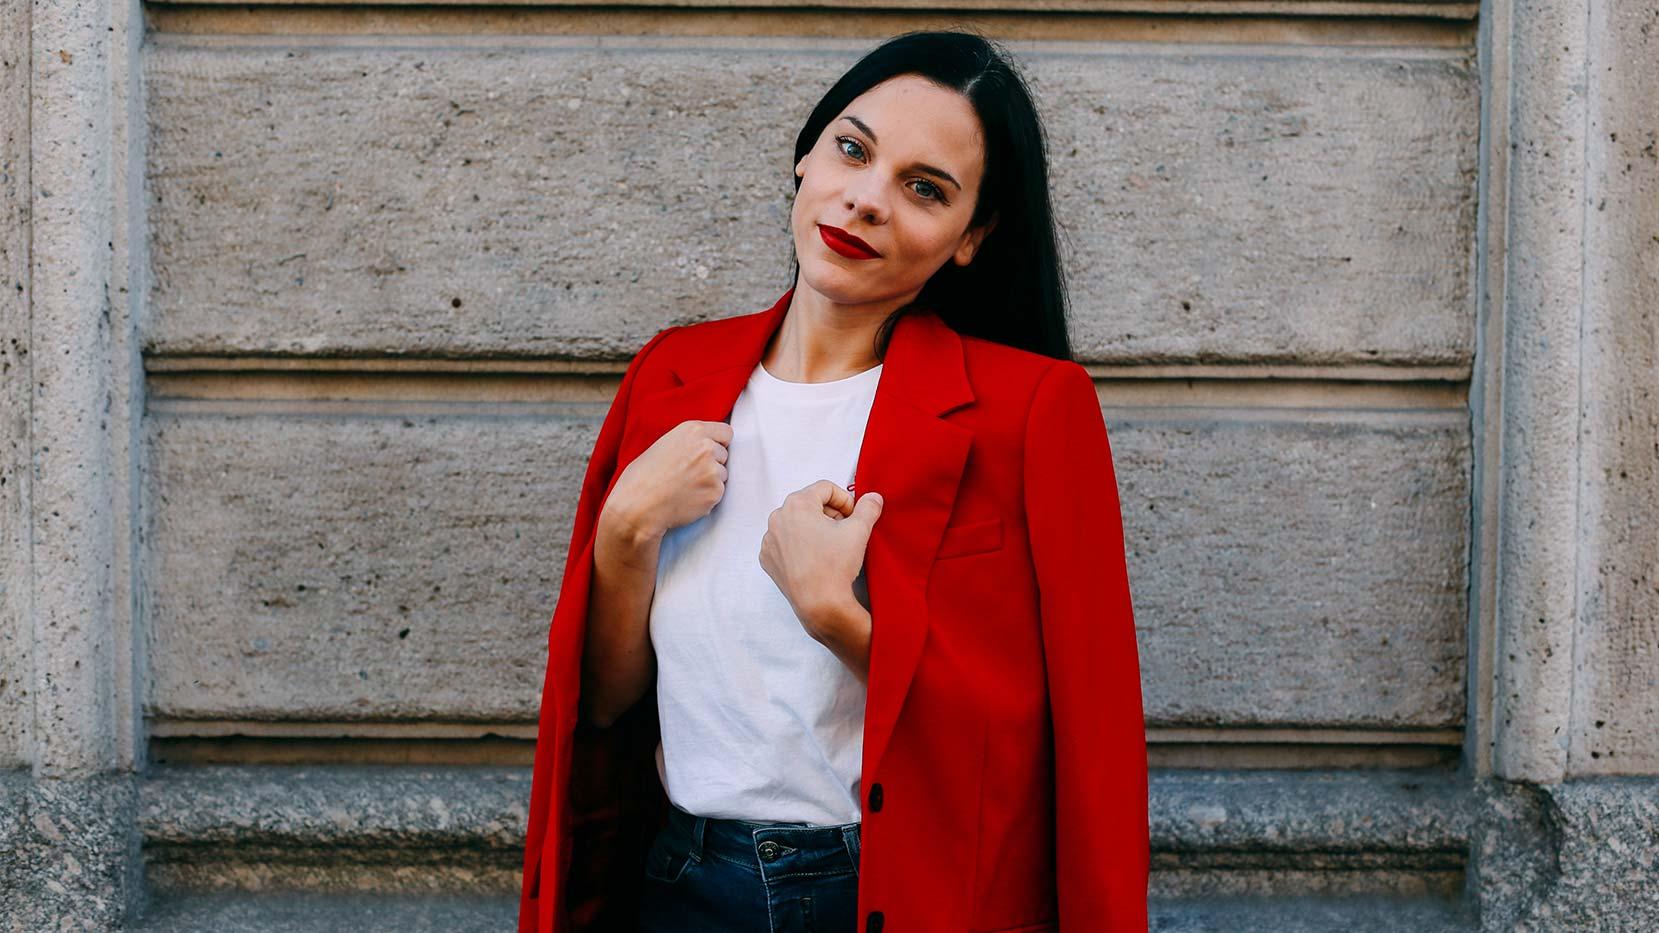 Elena Schiavon im Portrait